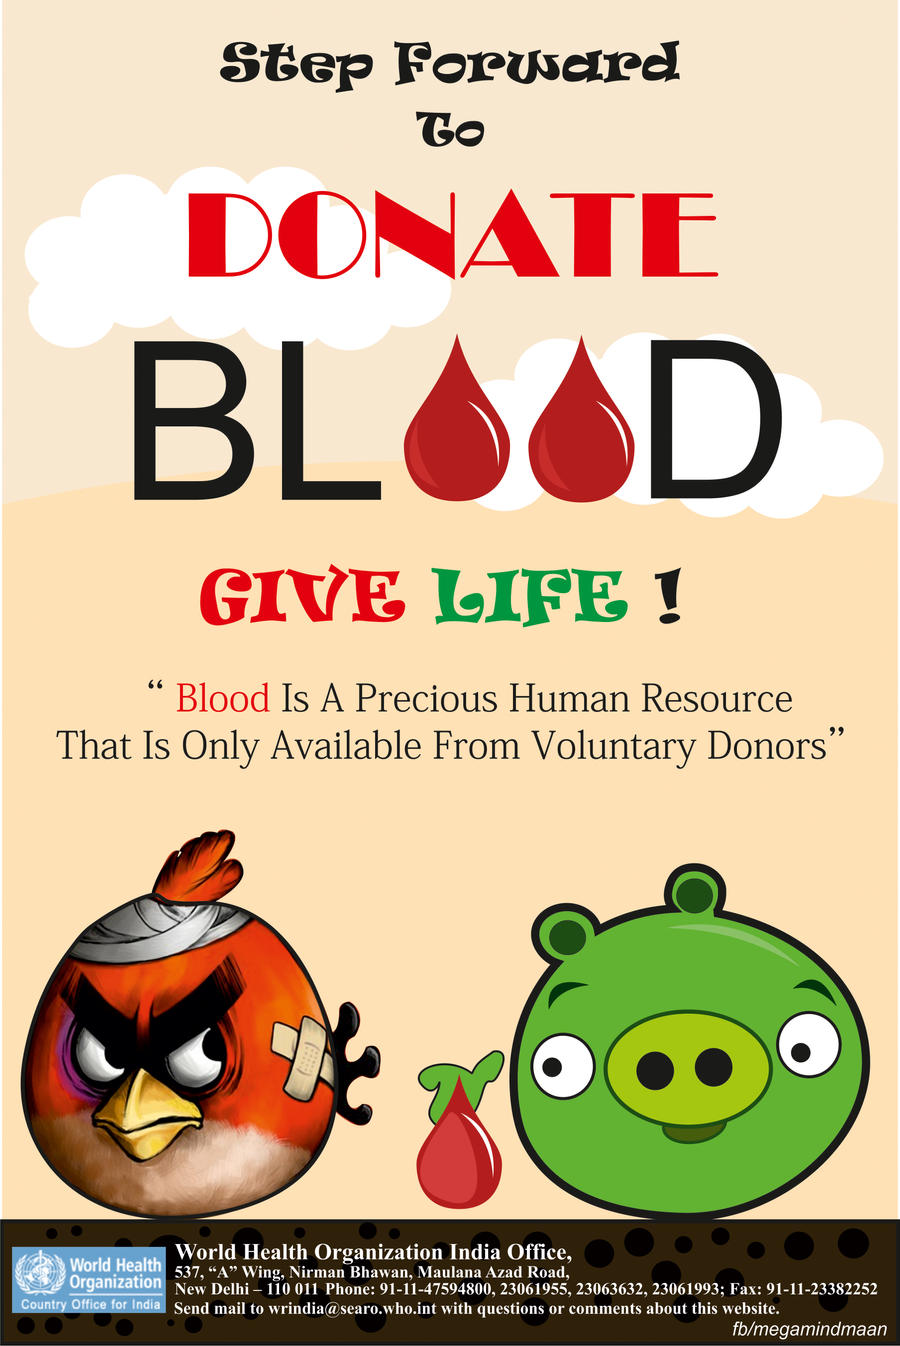 poster on blood donation by megamindmaan on deviantart